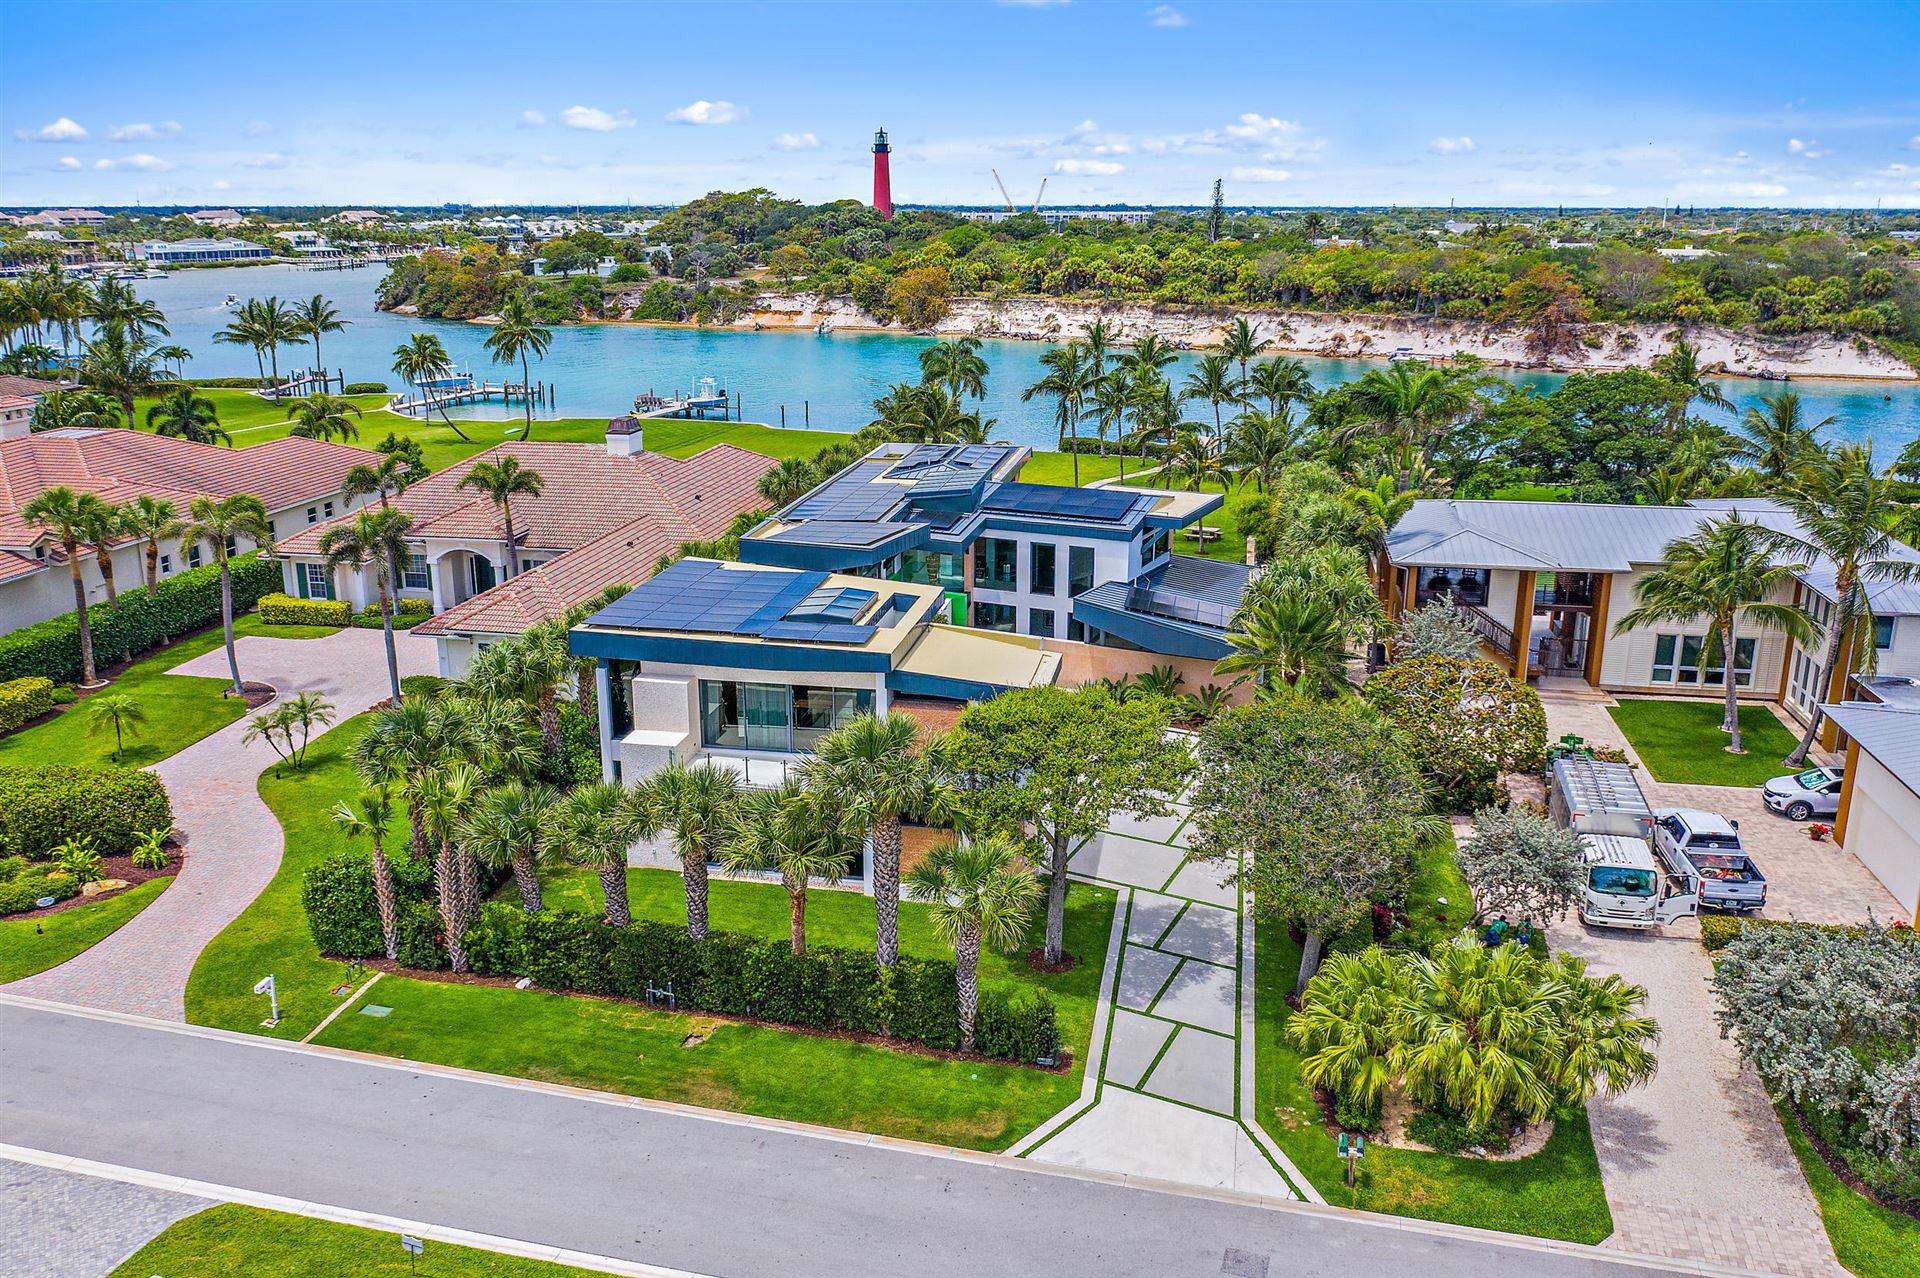 100 Lighthouse Drive, Jupiter Inlet Colony, FL 33469 - MLS#: RX-10712457